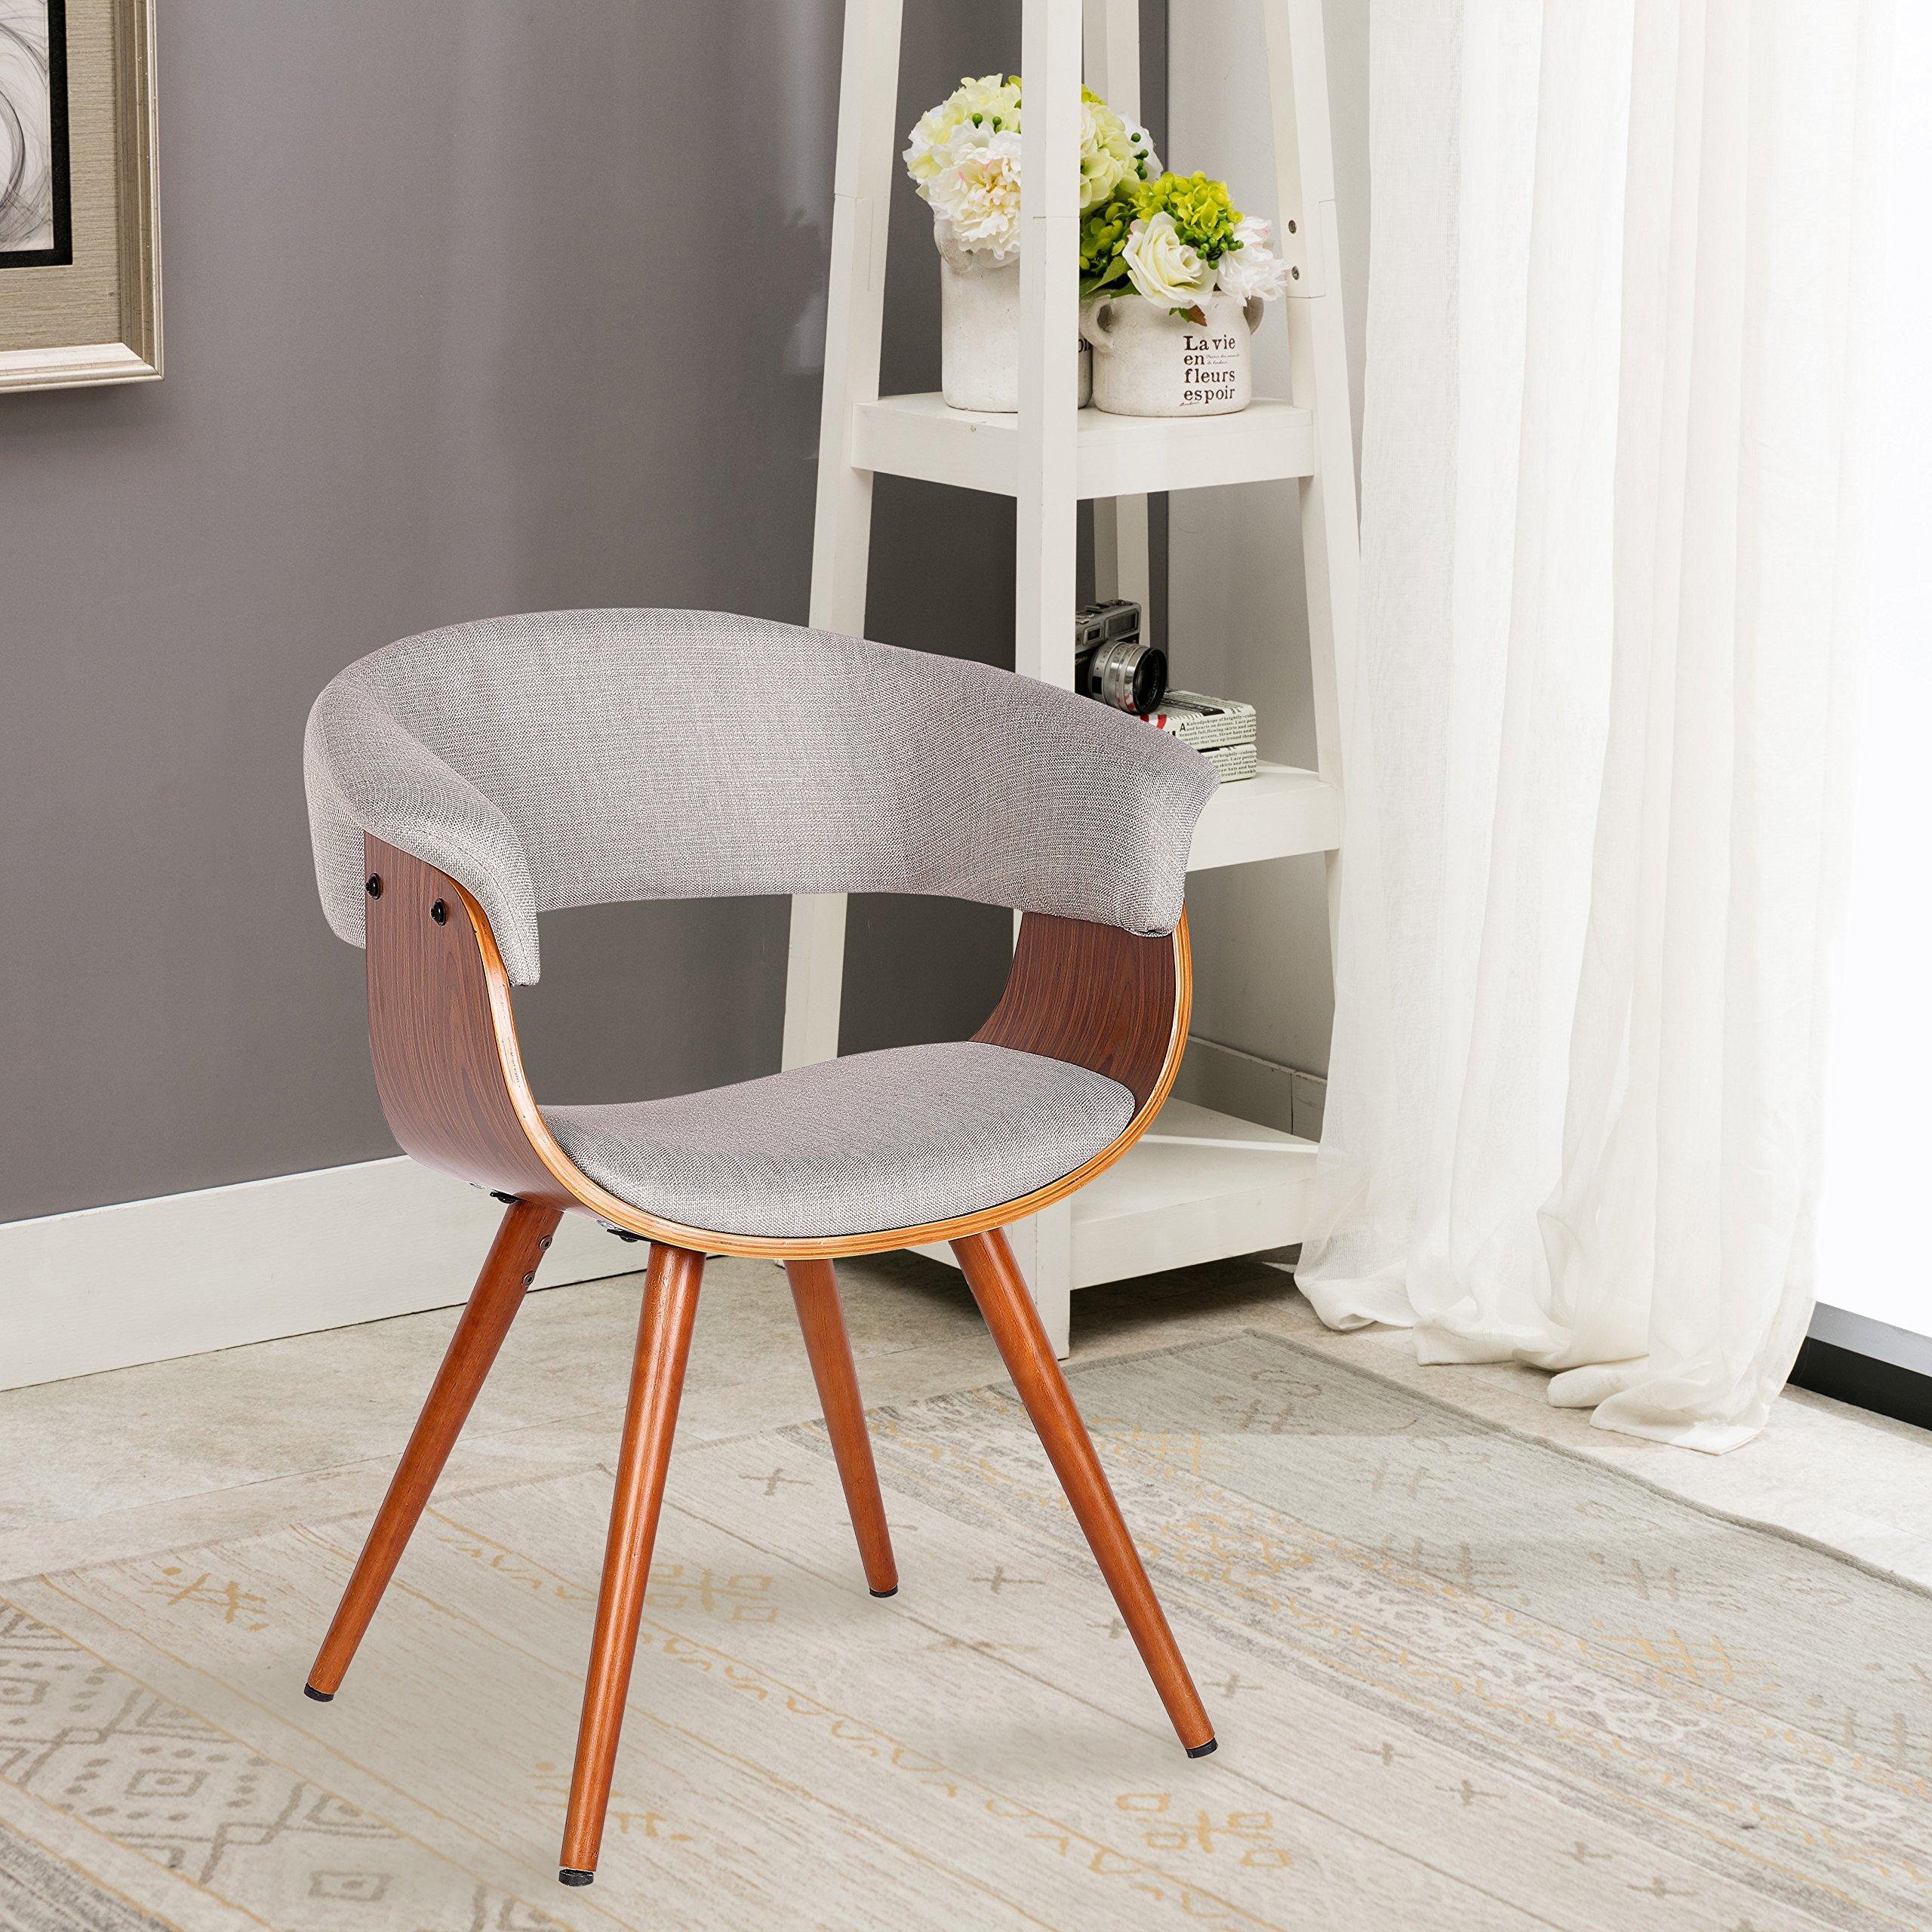 Porthos Home Finola Upholstered Side Seat, Grey